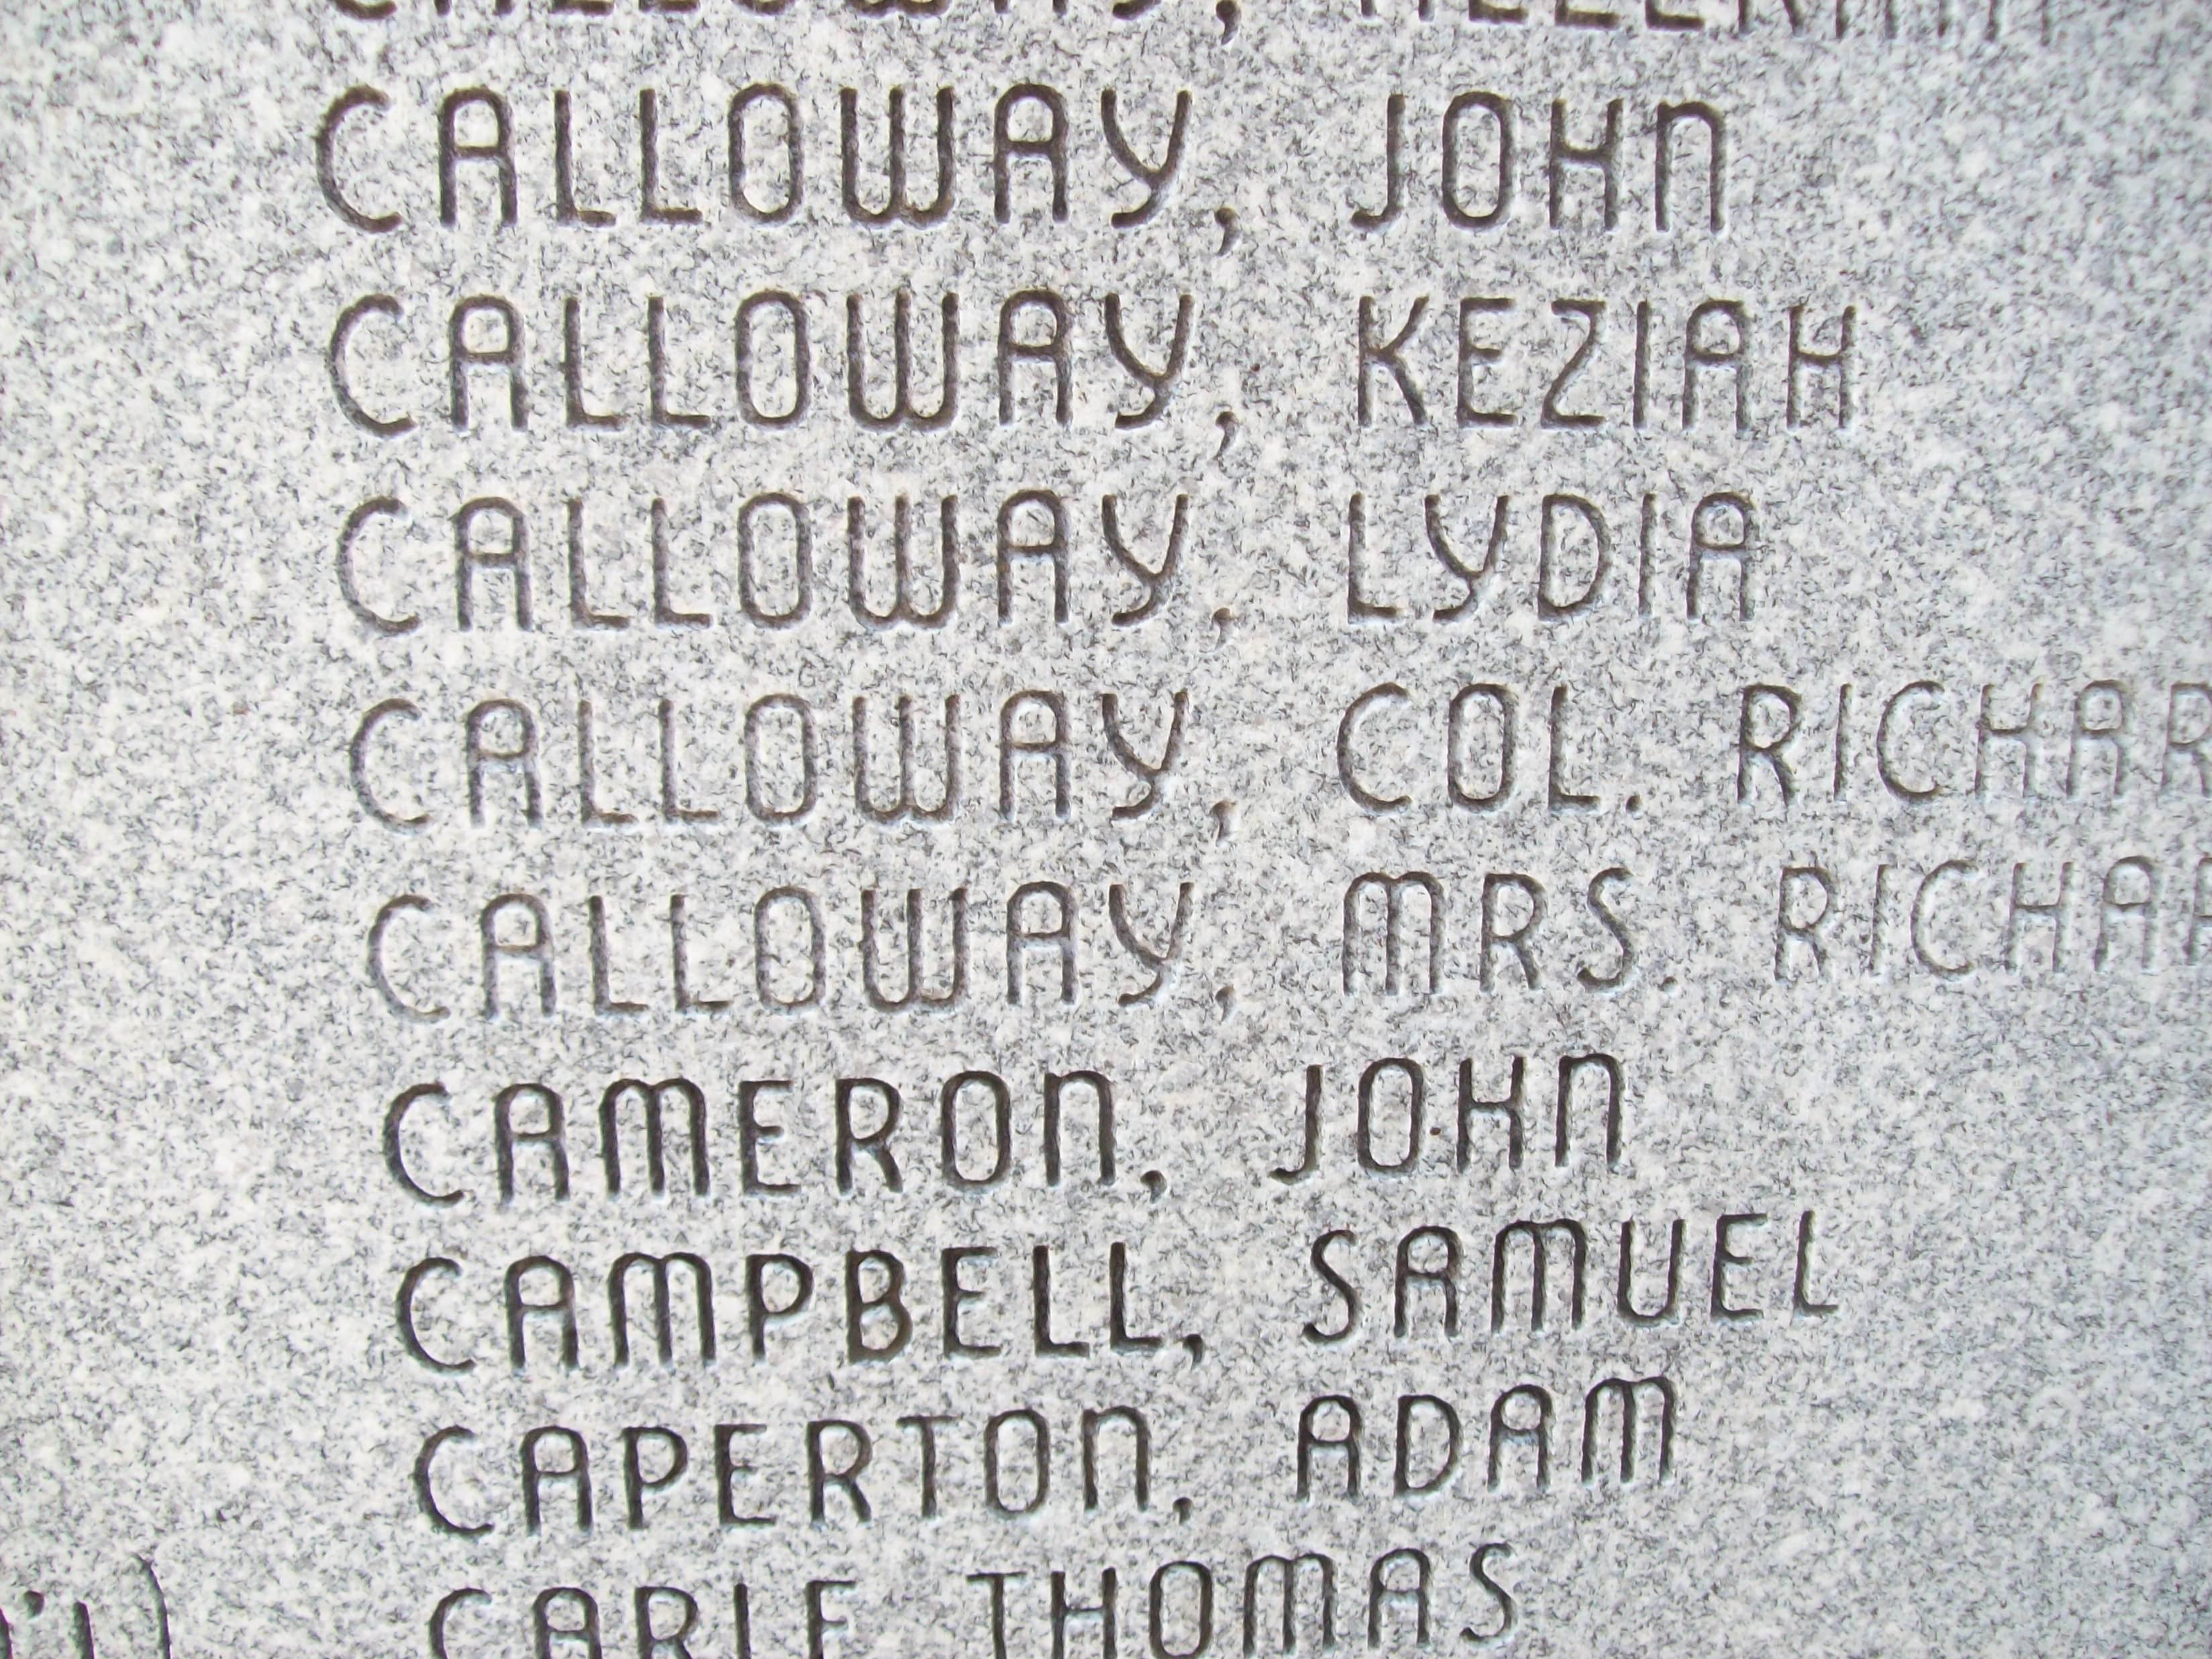 Col Richard Callaway